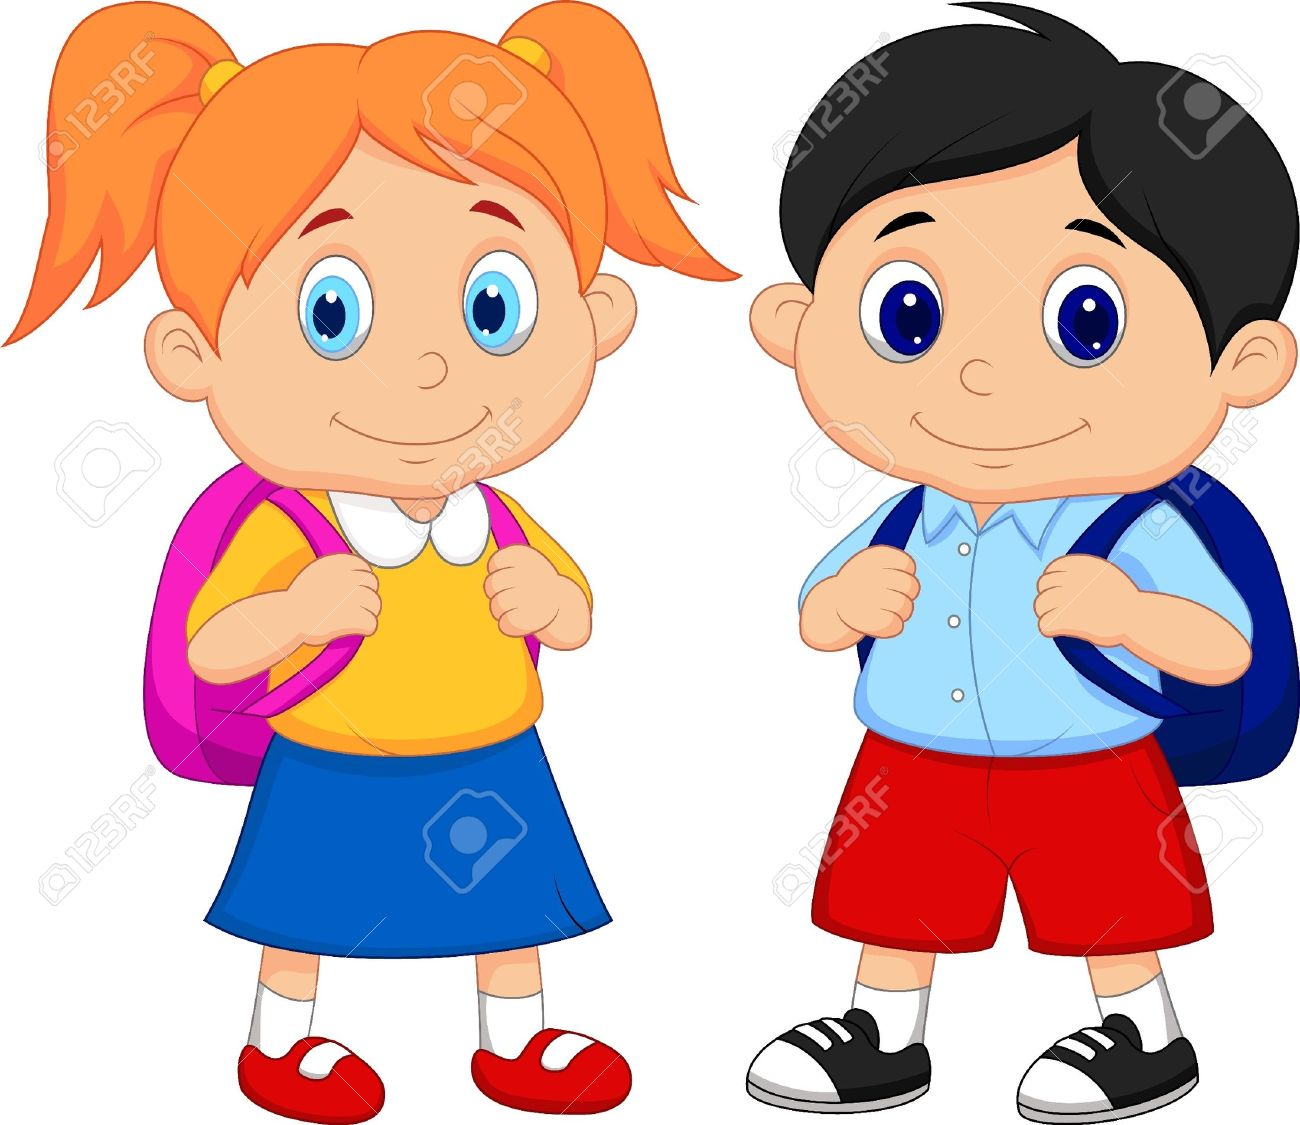 Hallway clipart animated & collection Cartoon hallway Students